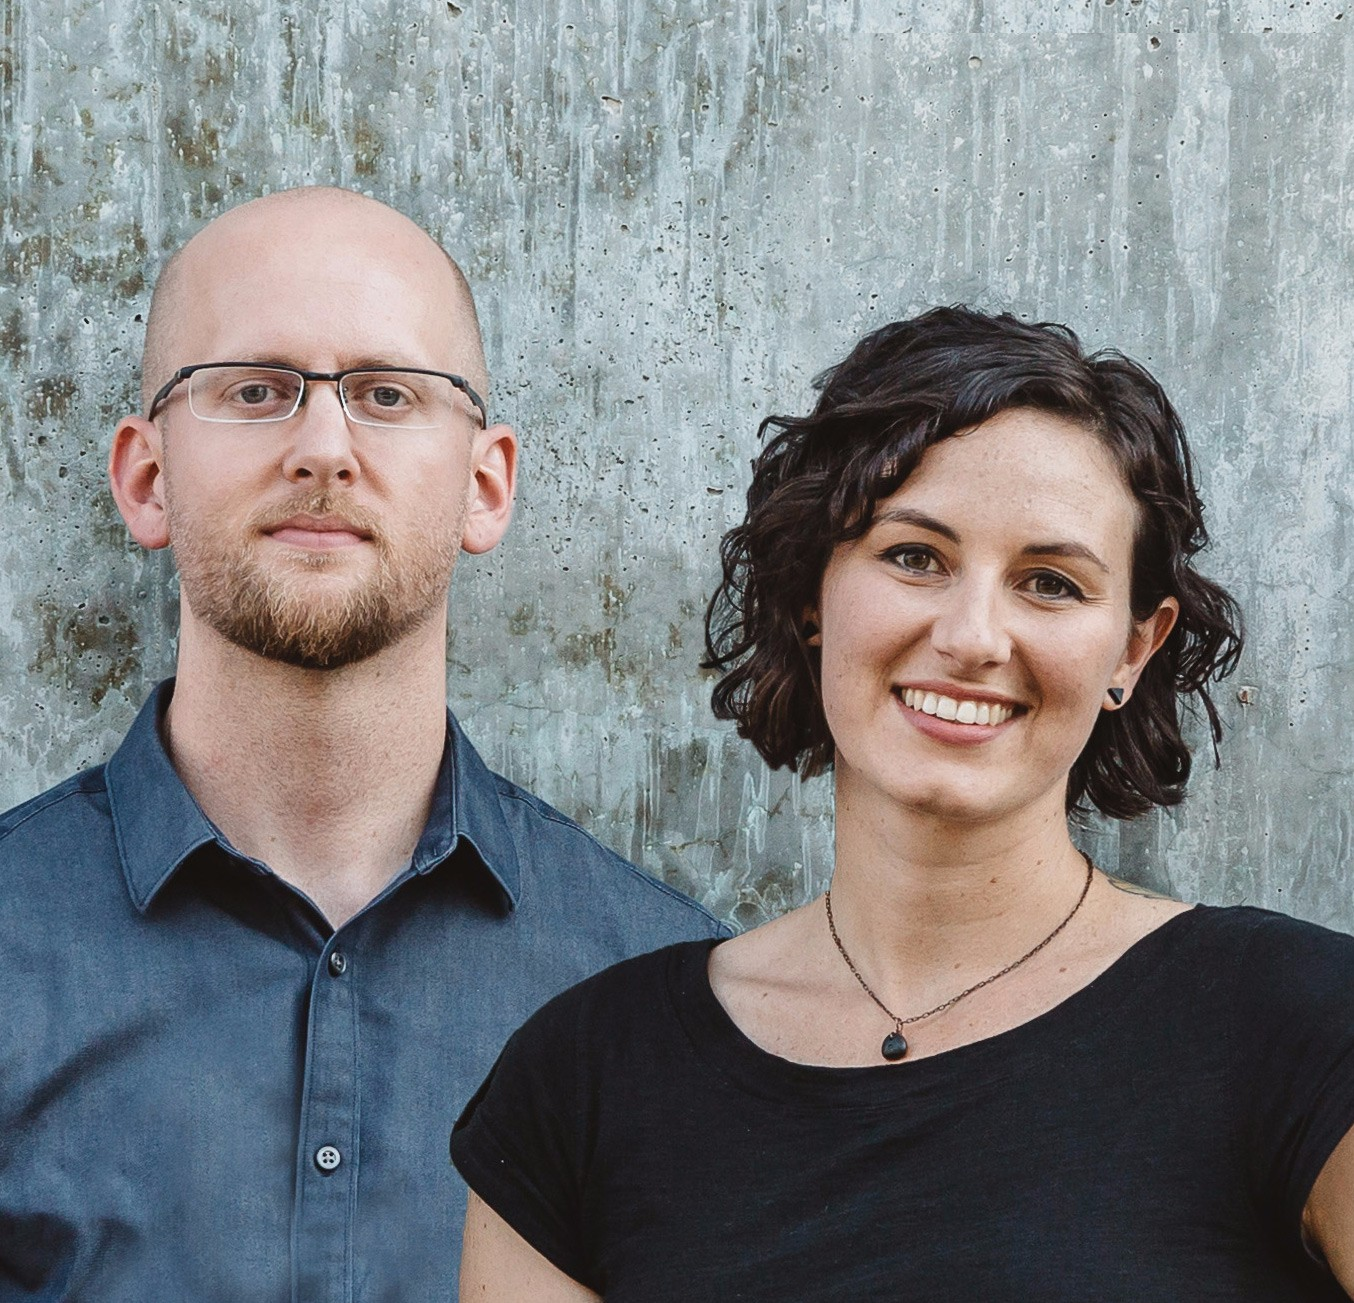 Erik Flowers and Megan Miller